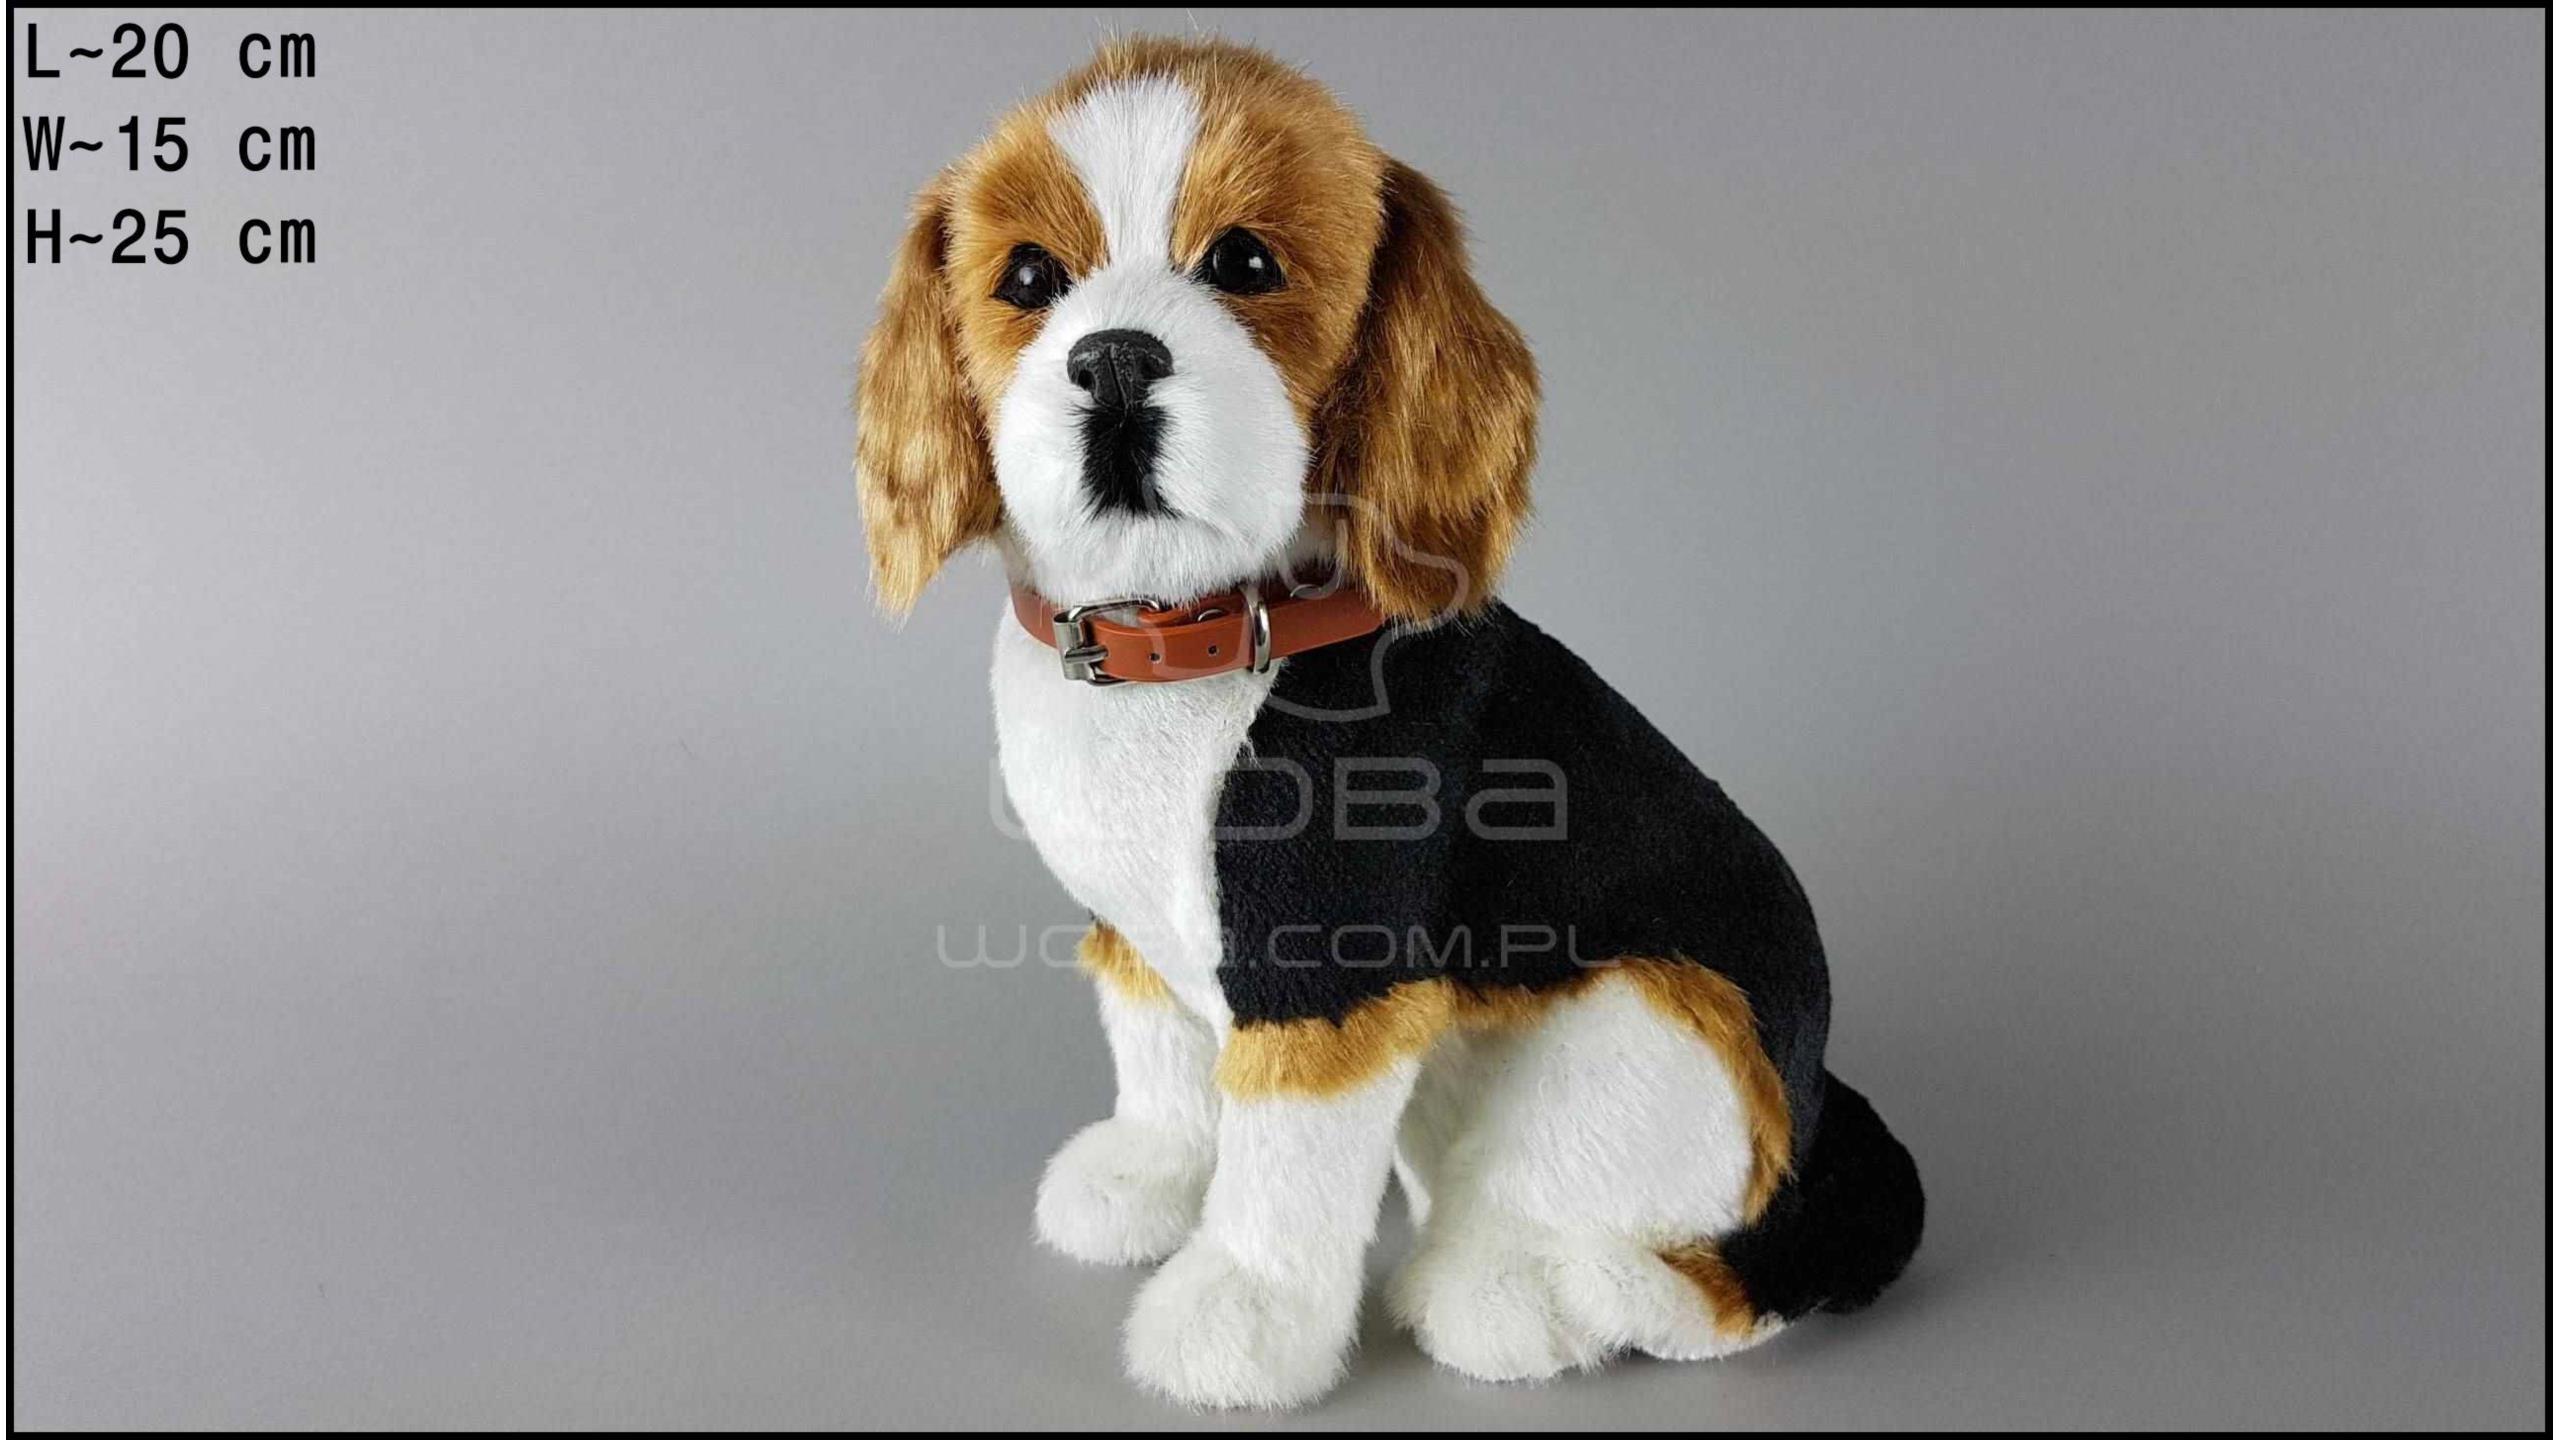 Pies duży - Beagle